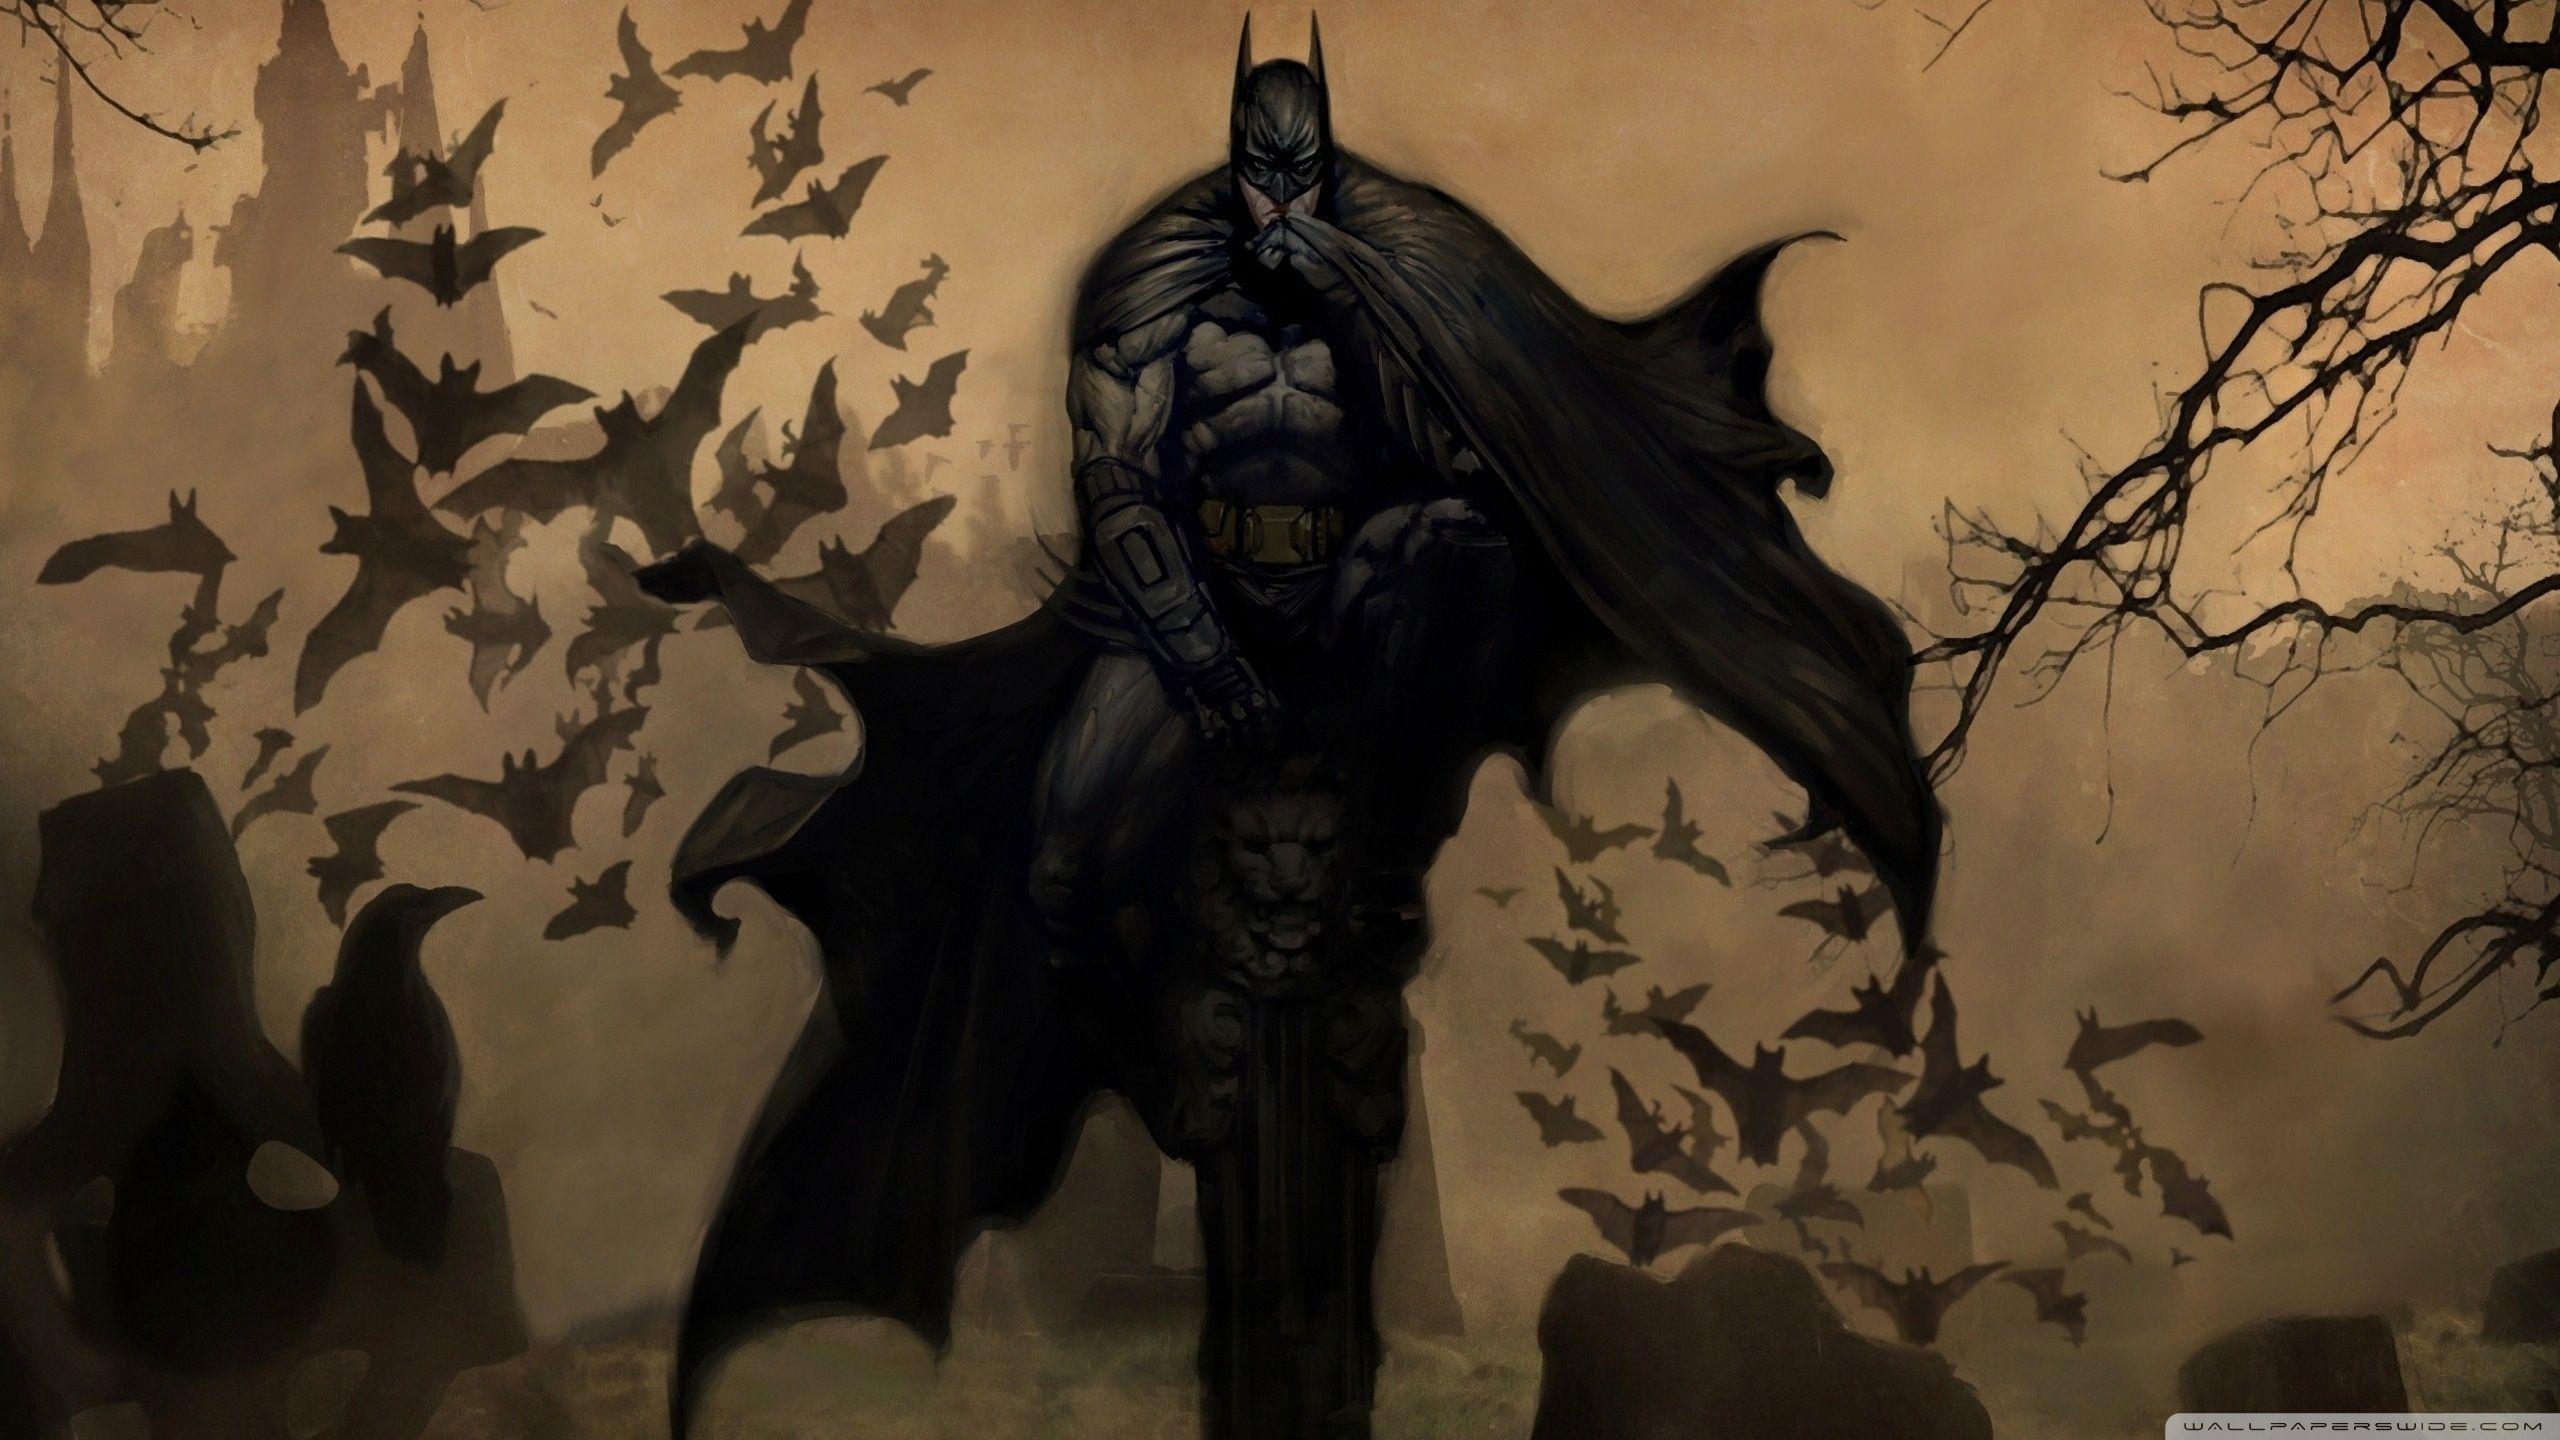 Batman Wallpapers Top Free Batman Backgrounds Wallpaperaccess